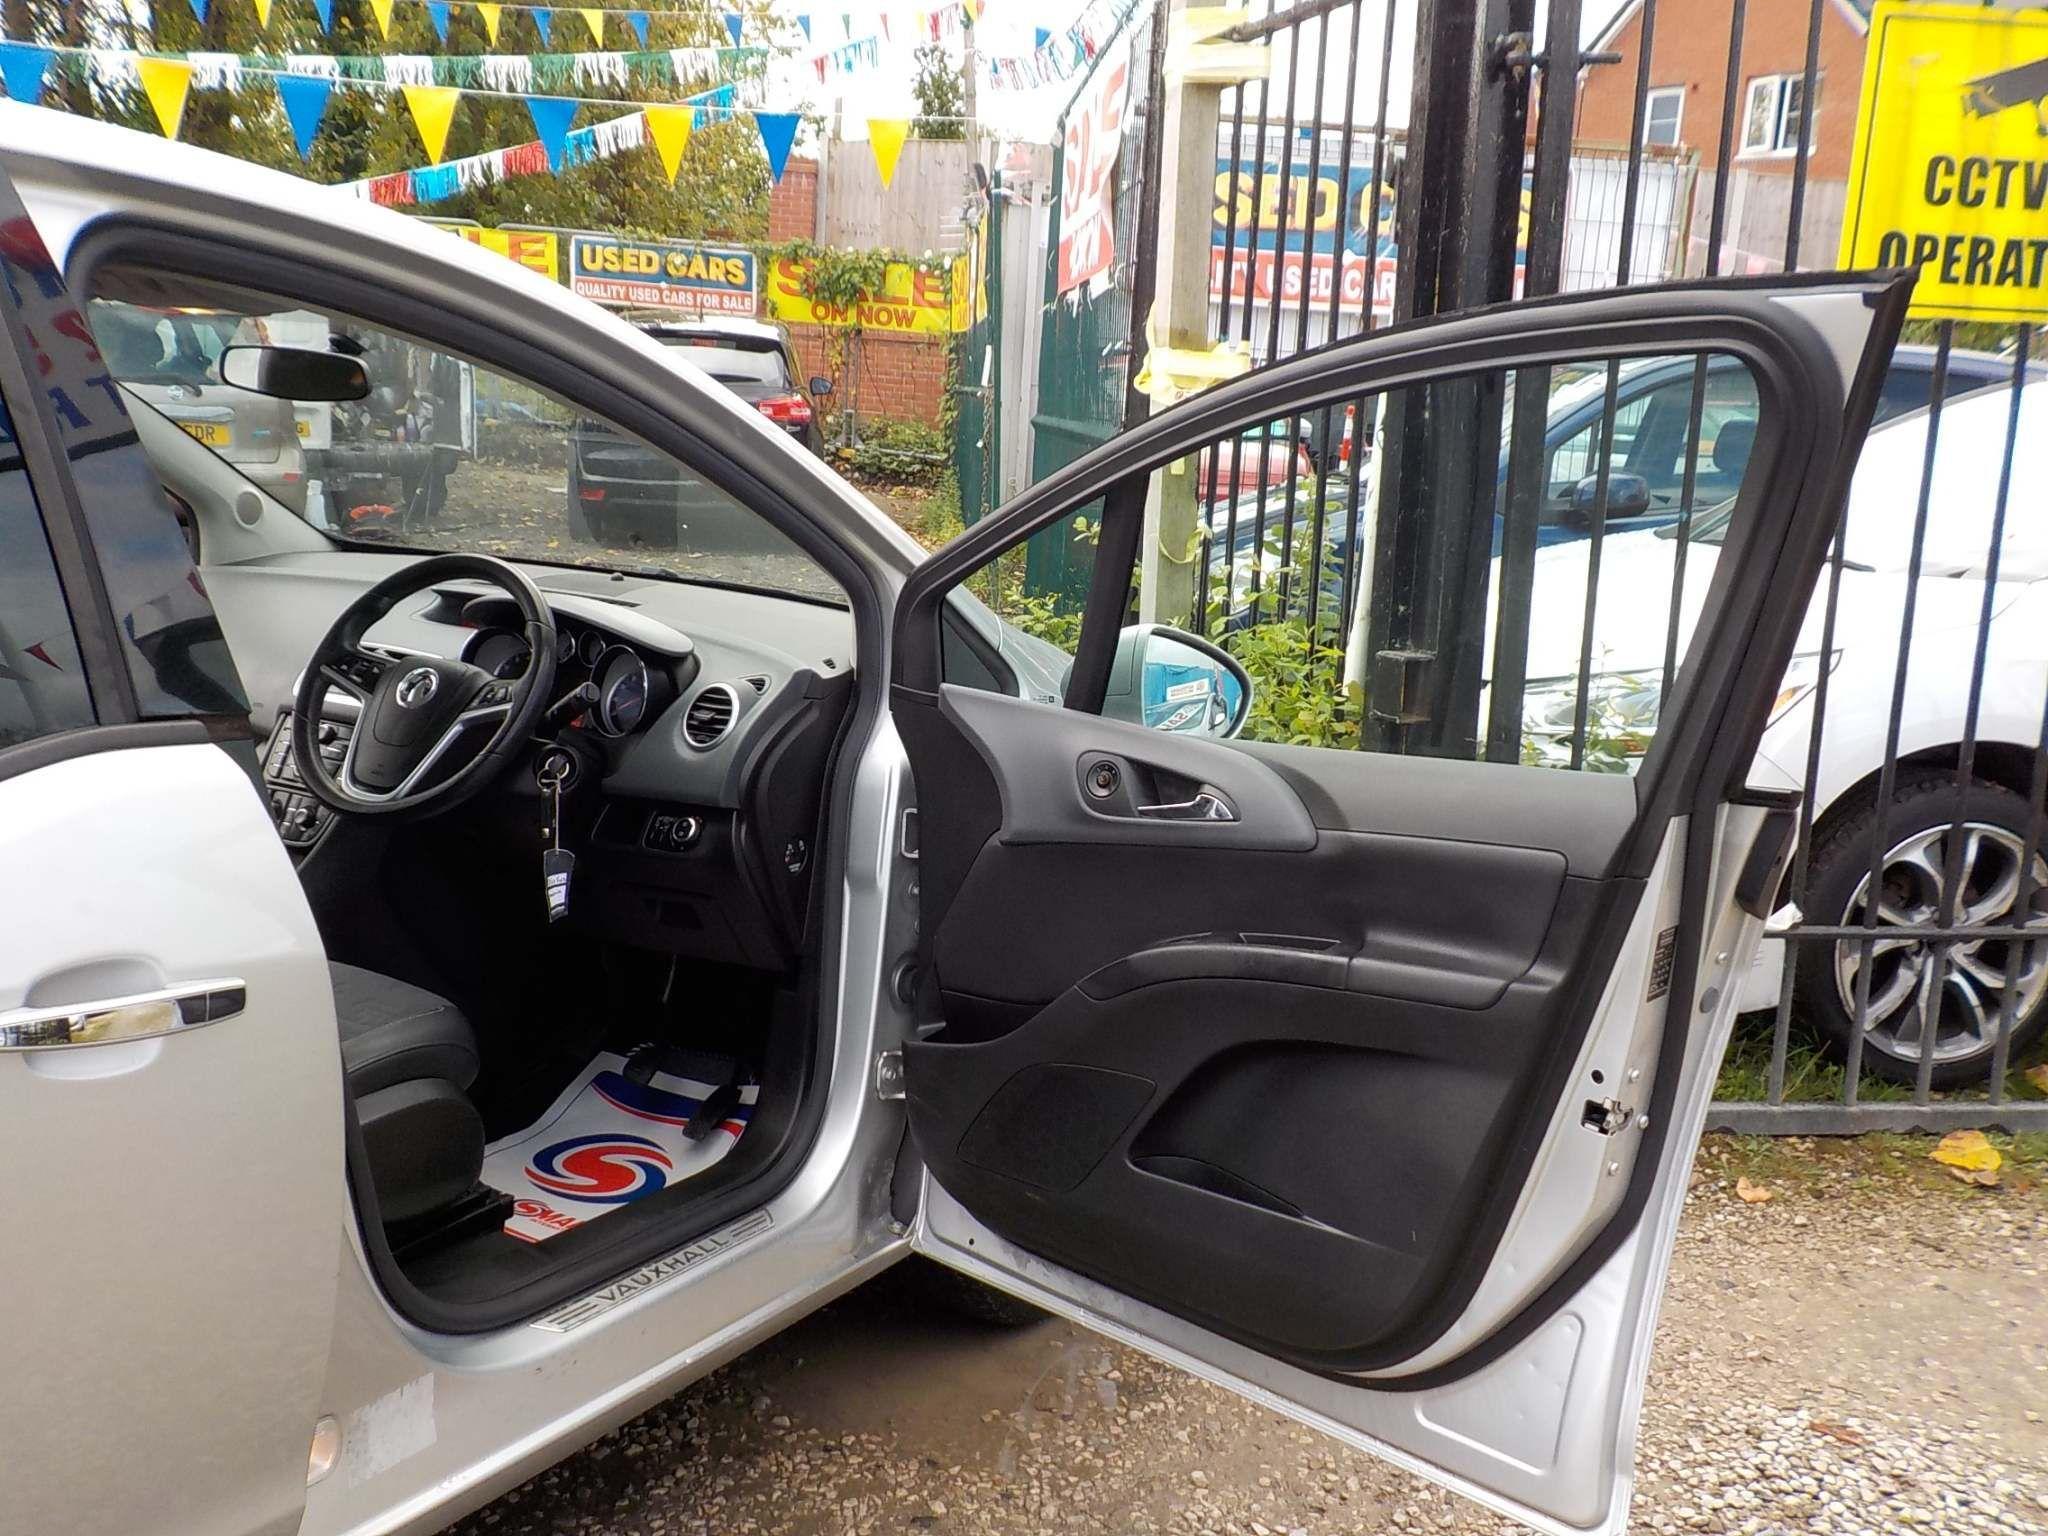 Vauxhall Meriva 1.4 i 16v SE 5dr (a/c)